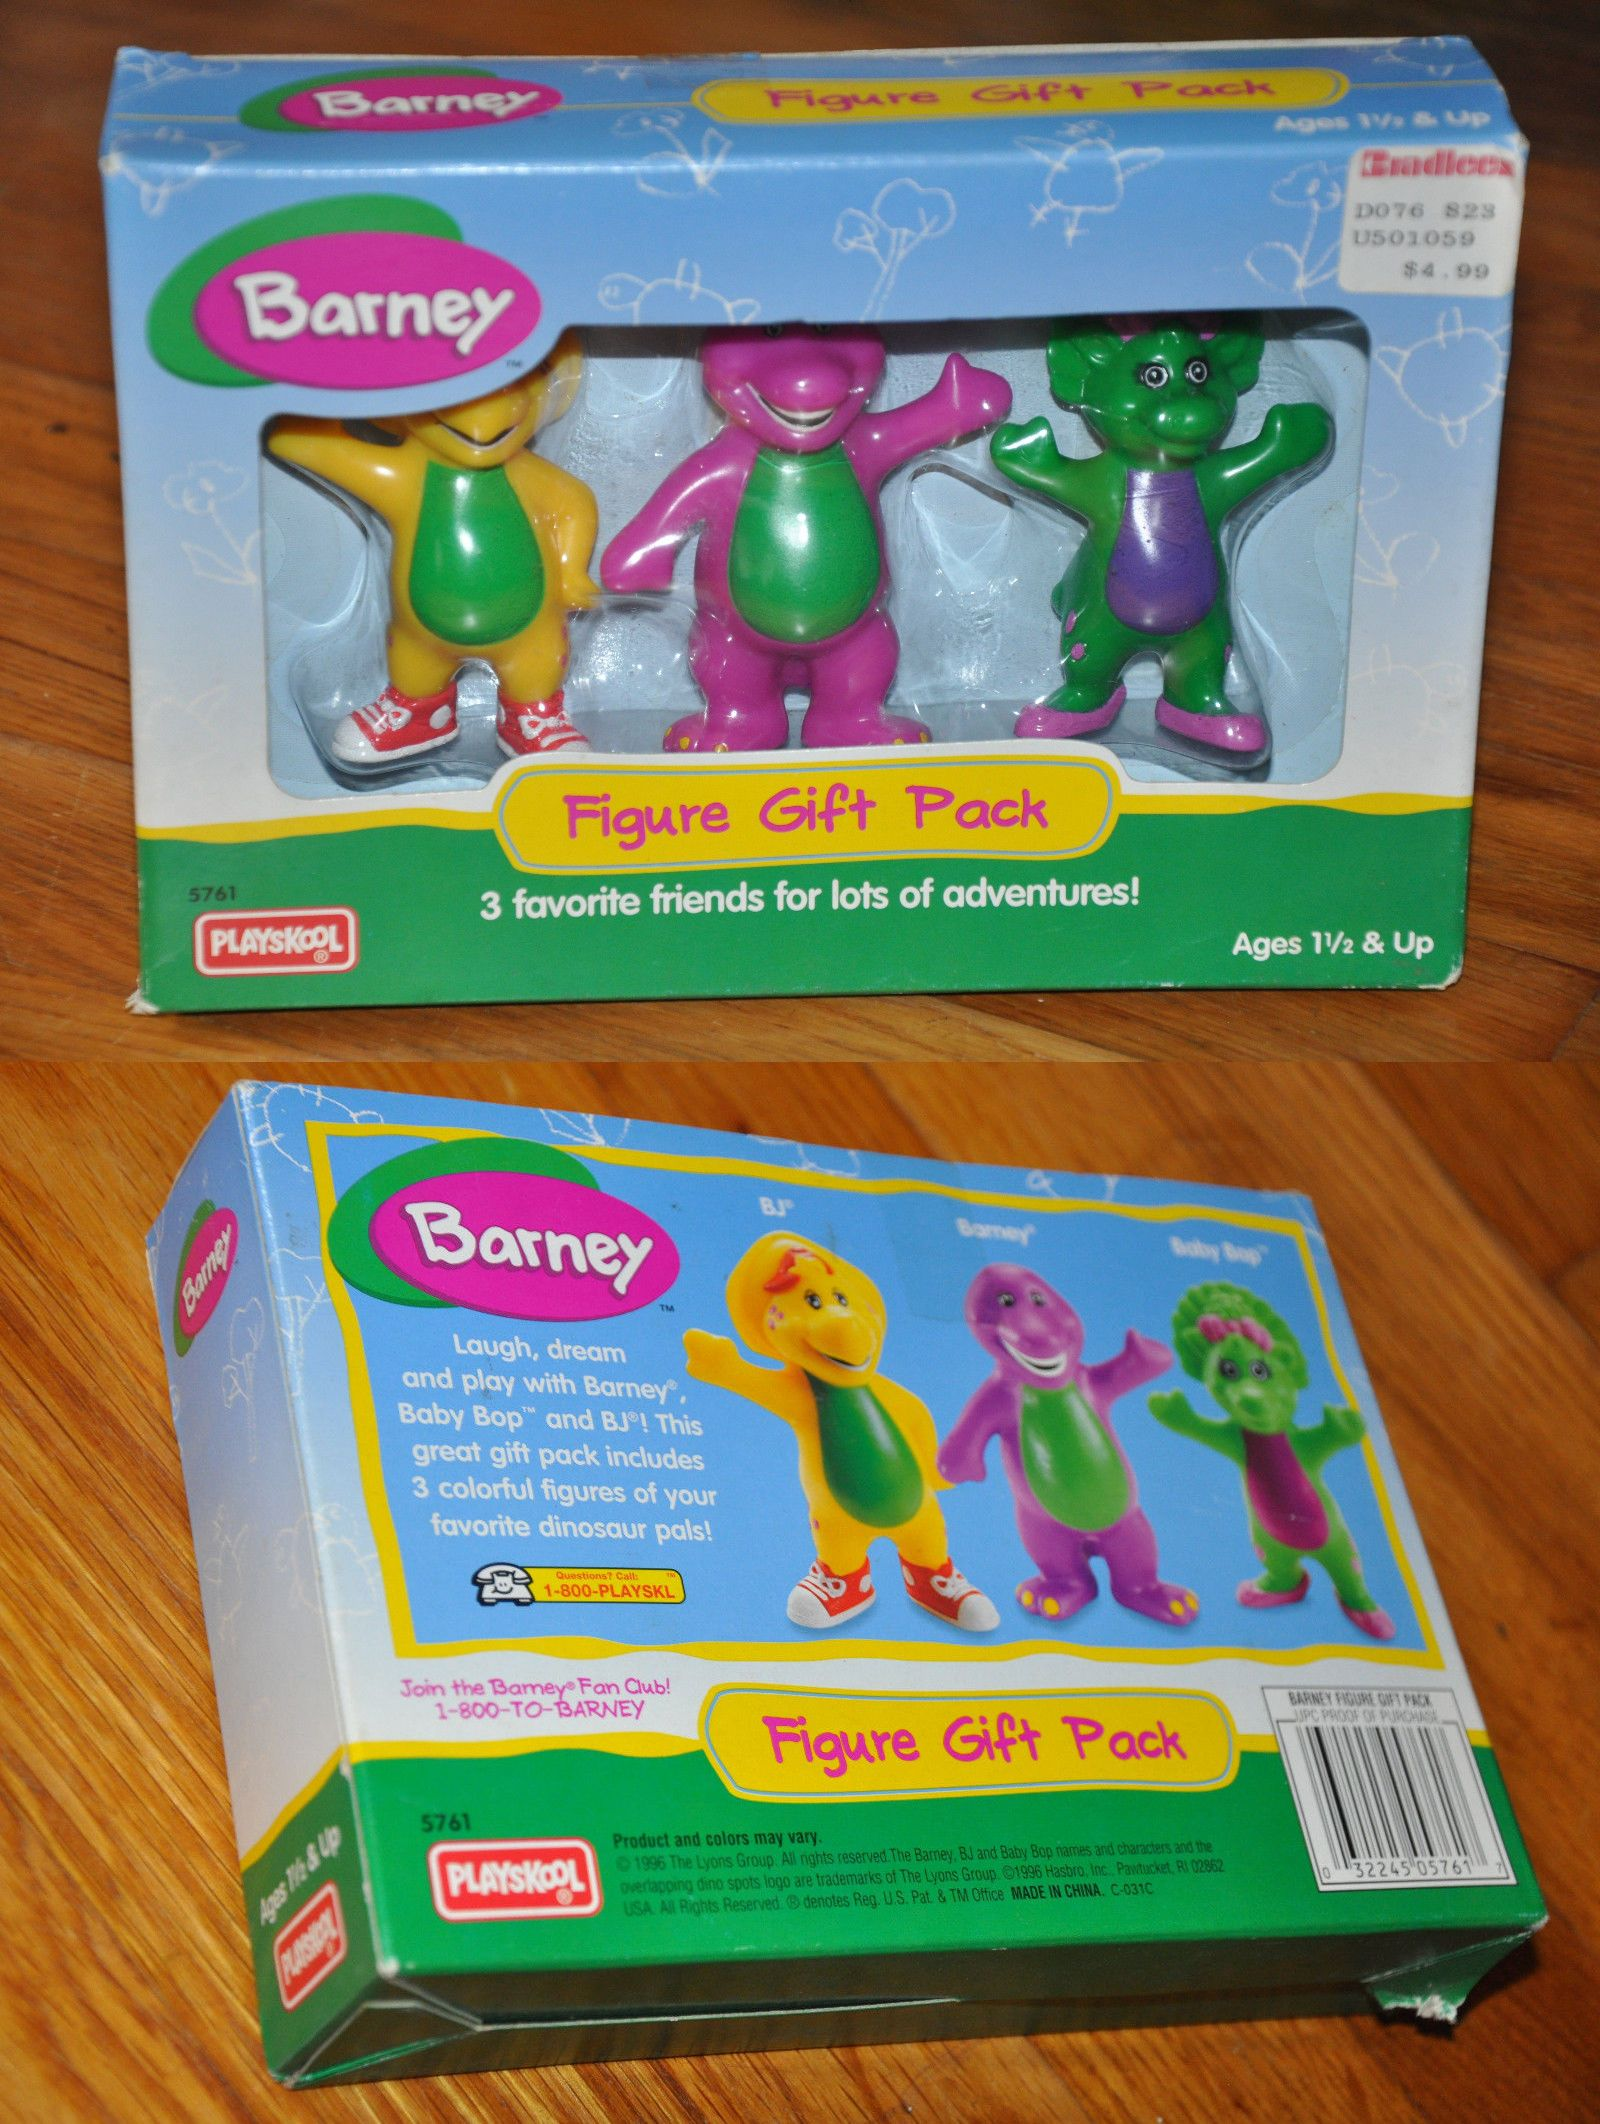 barney 2625 1996 playskool barney figure gift pack baby bop bj